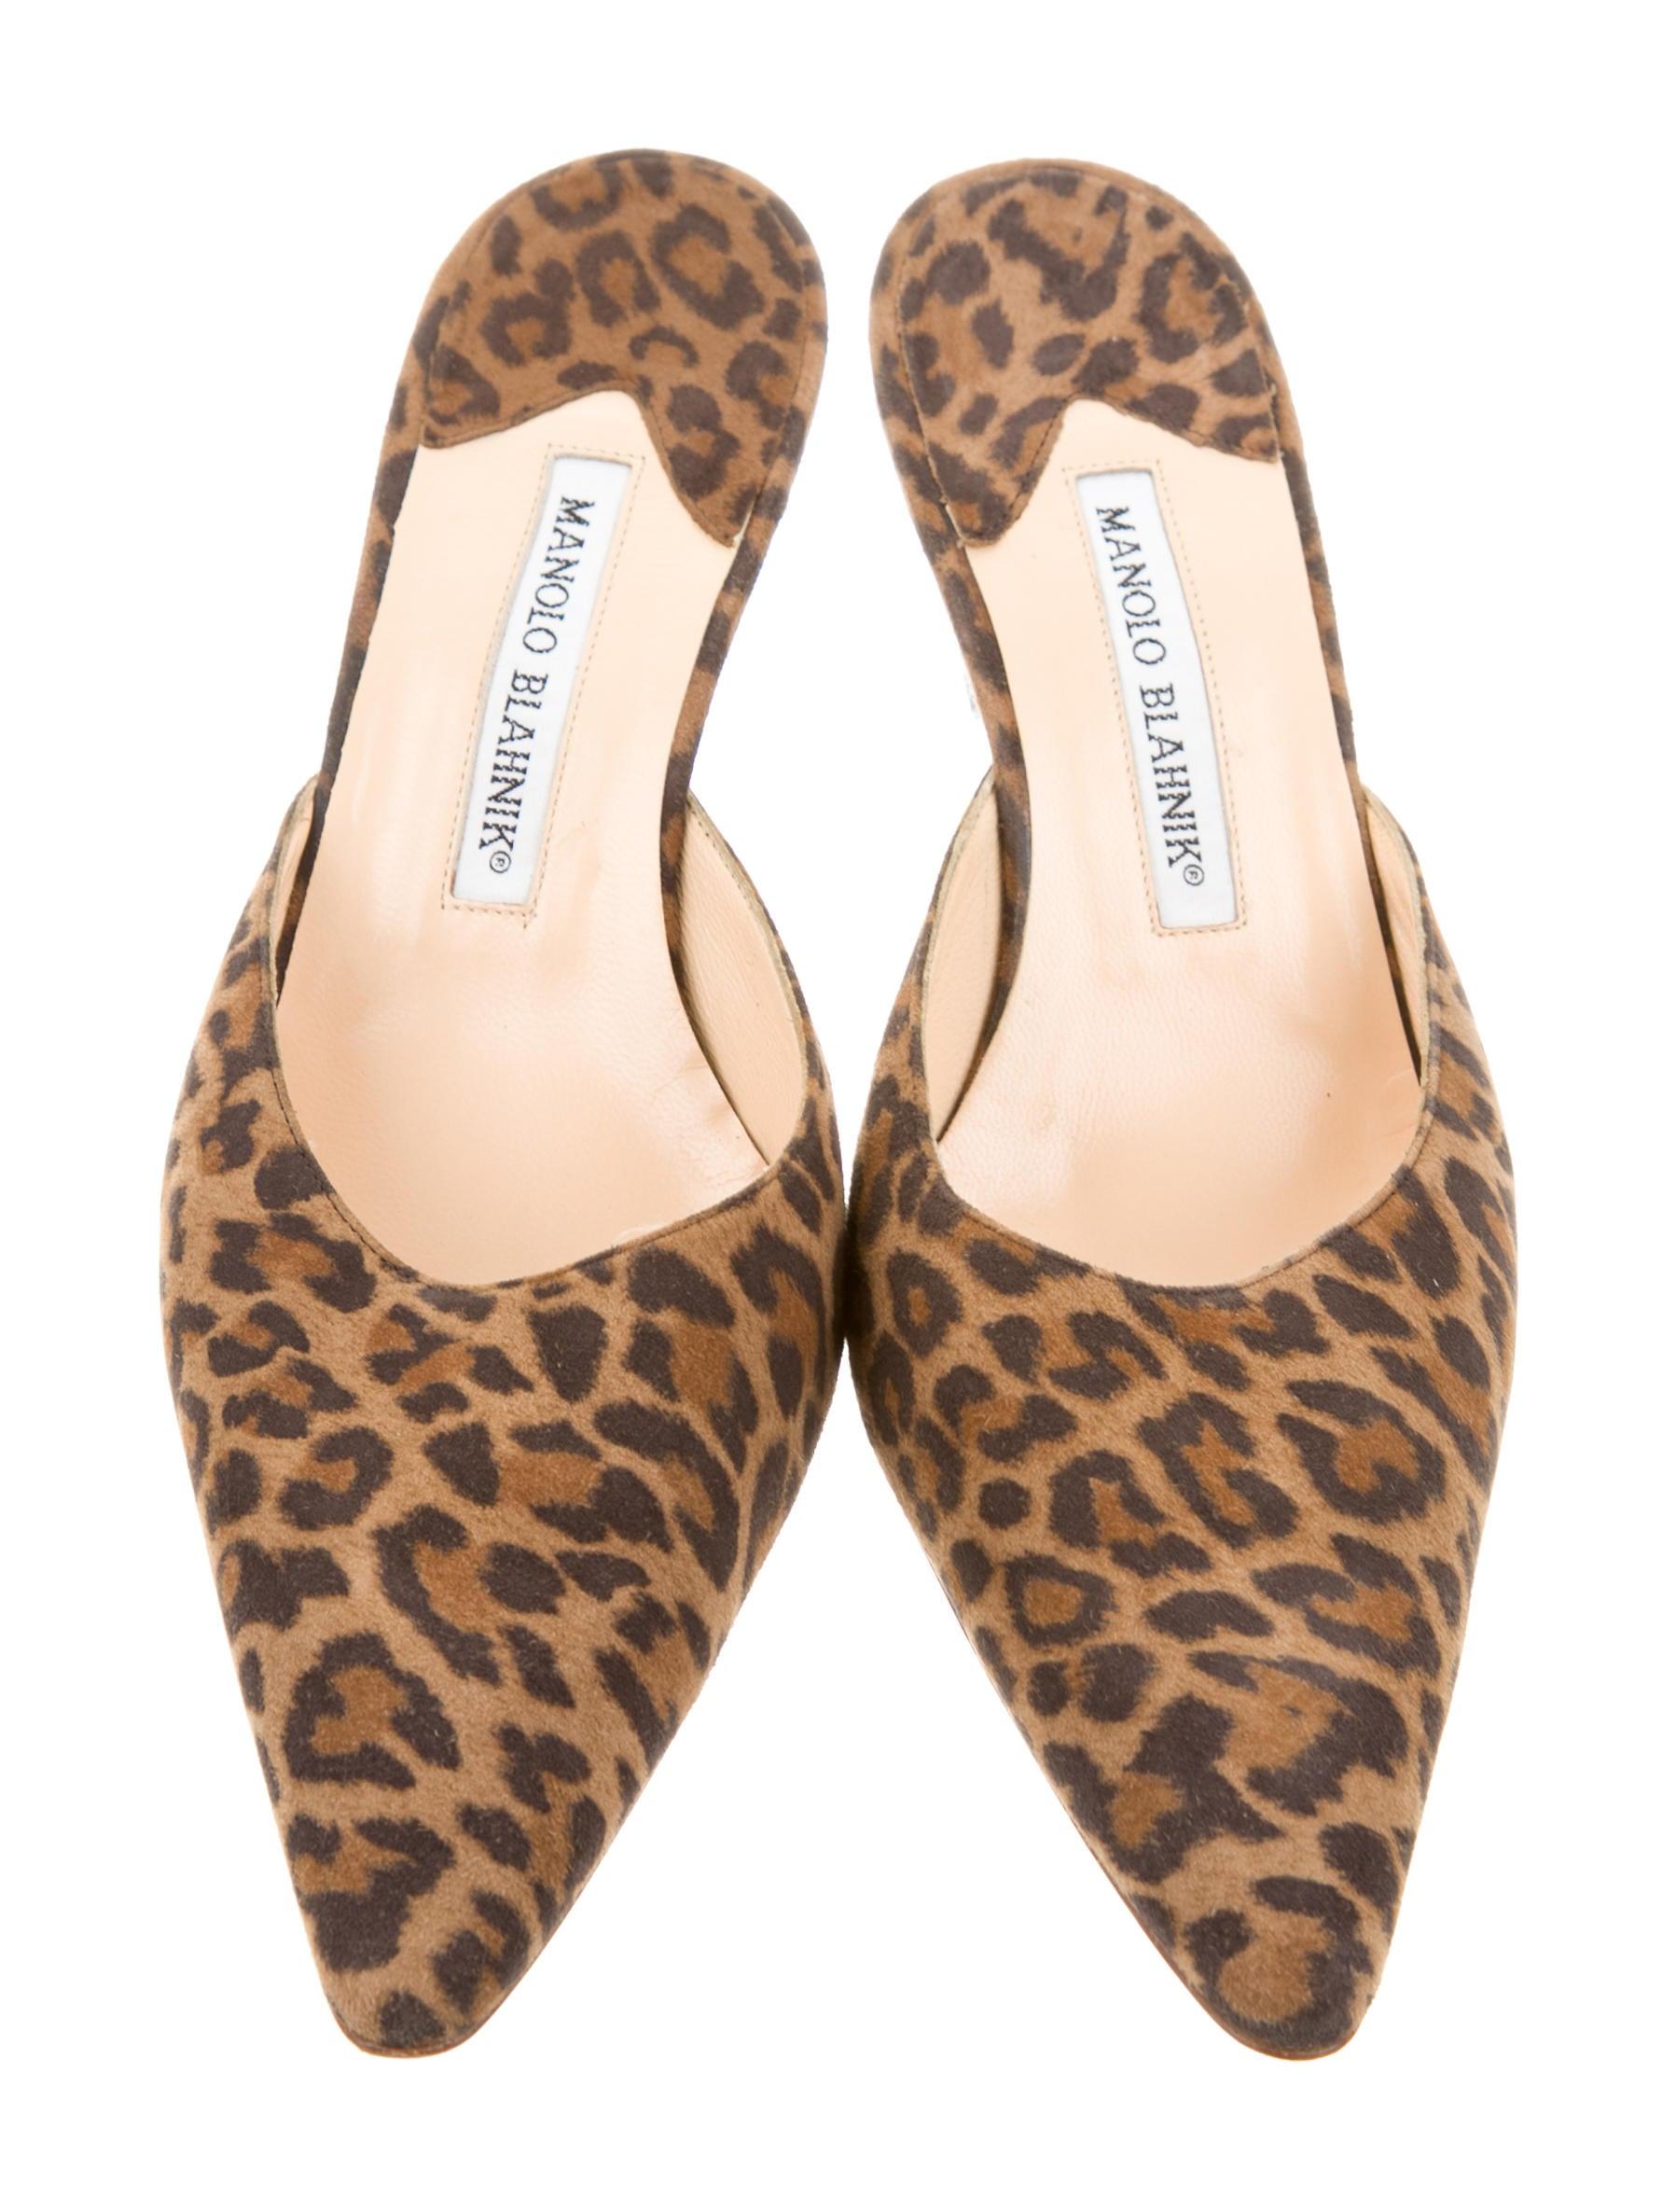 Manolo Blahnik Leopard Print Mules - Shoes - MOO60538 ...